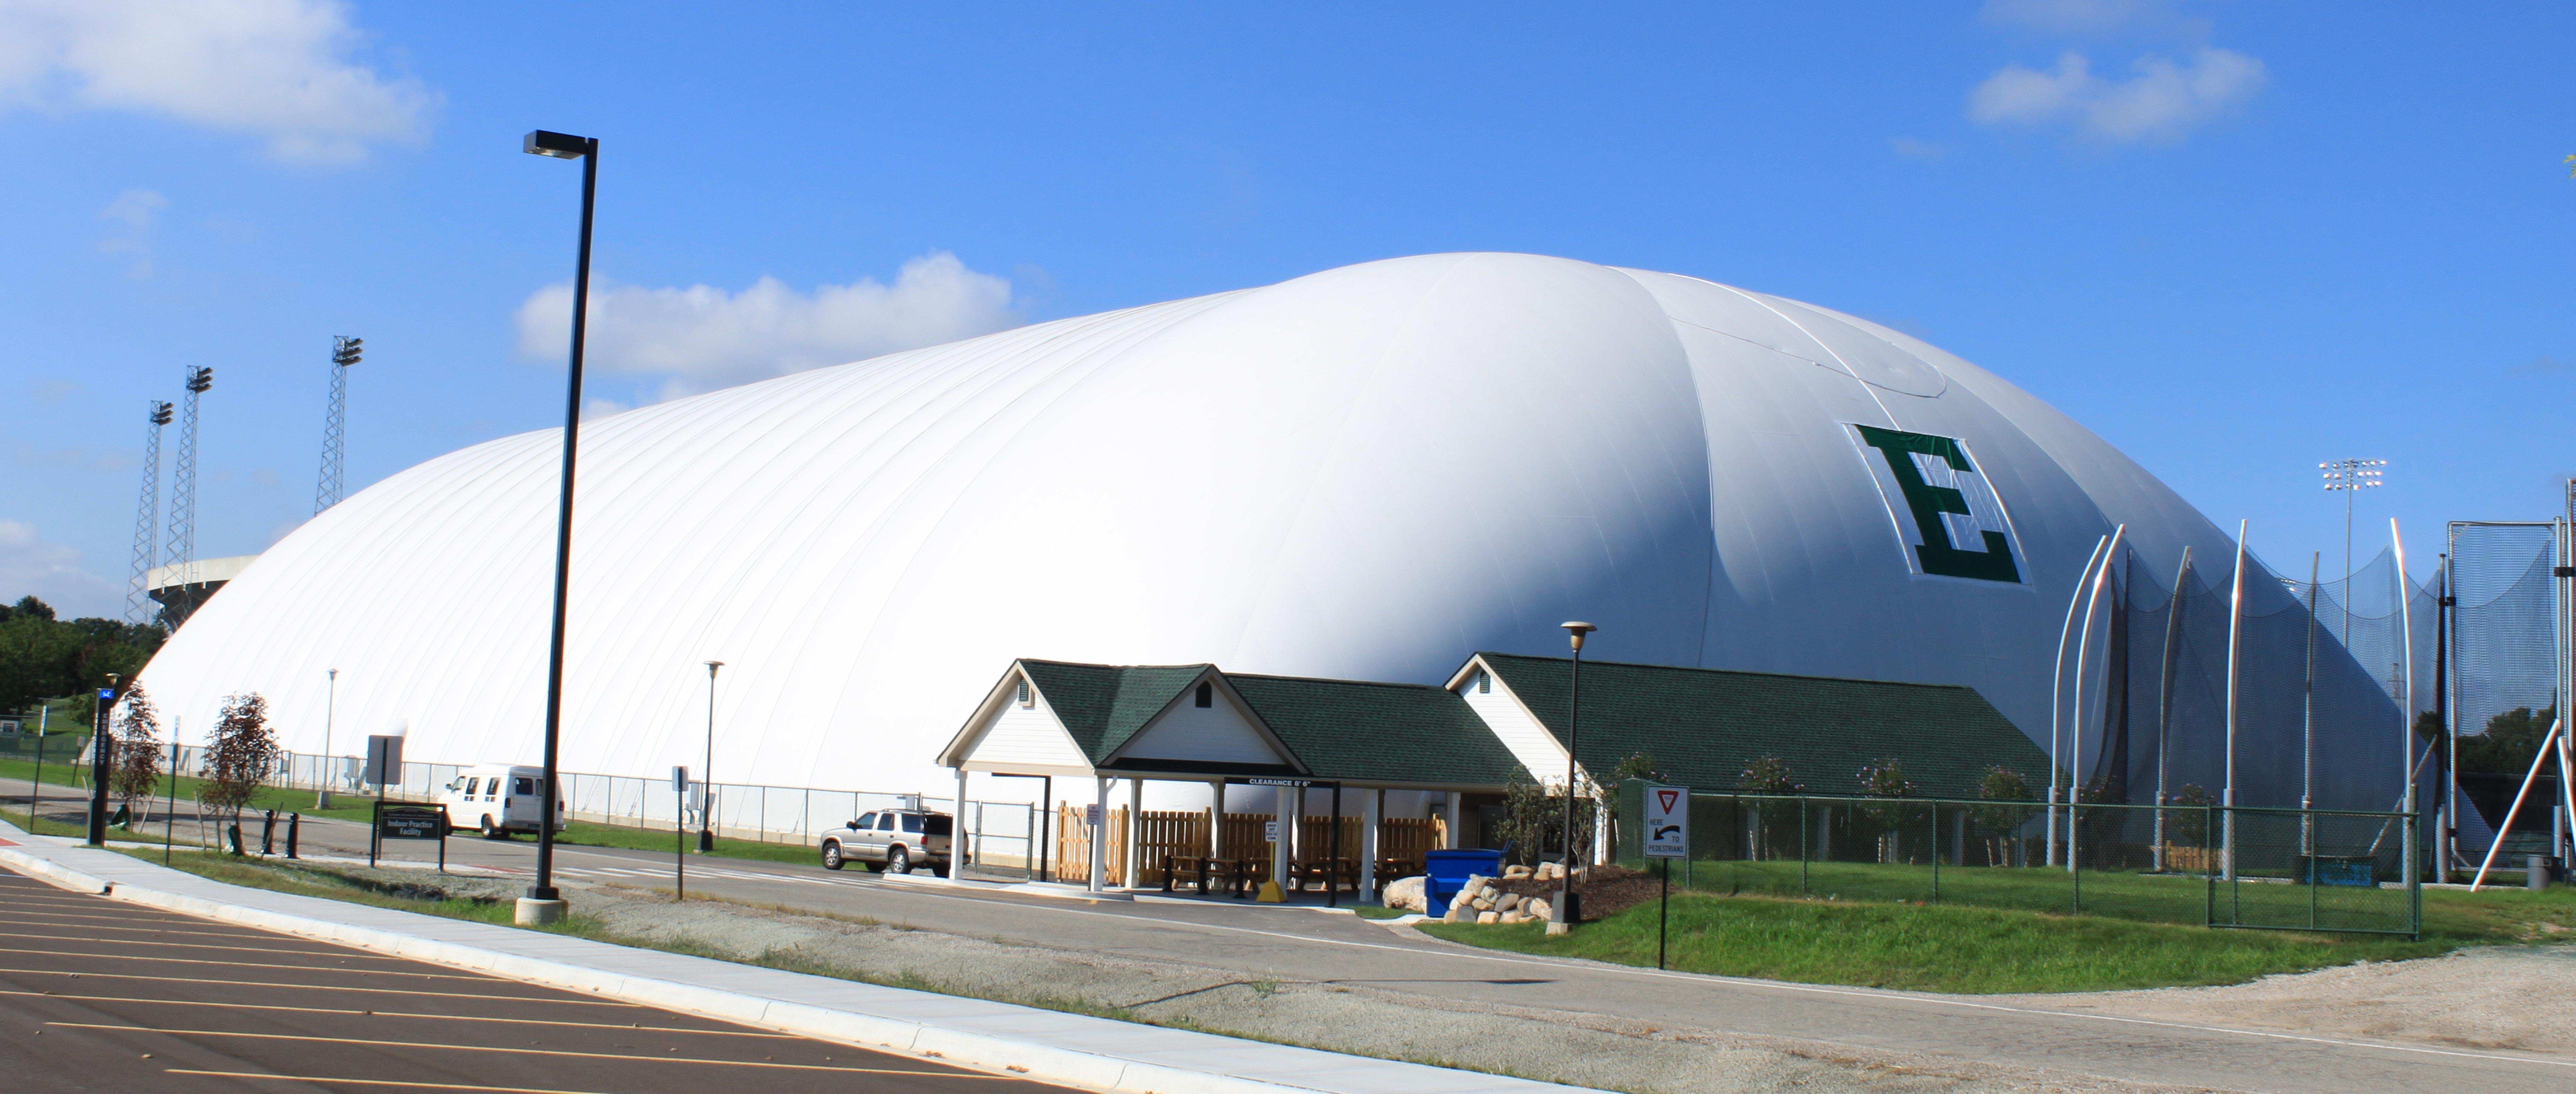 Eastern michigan University indoor practice facility